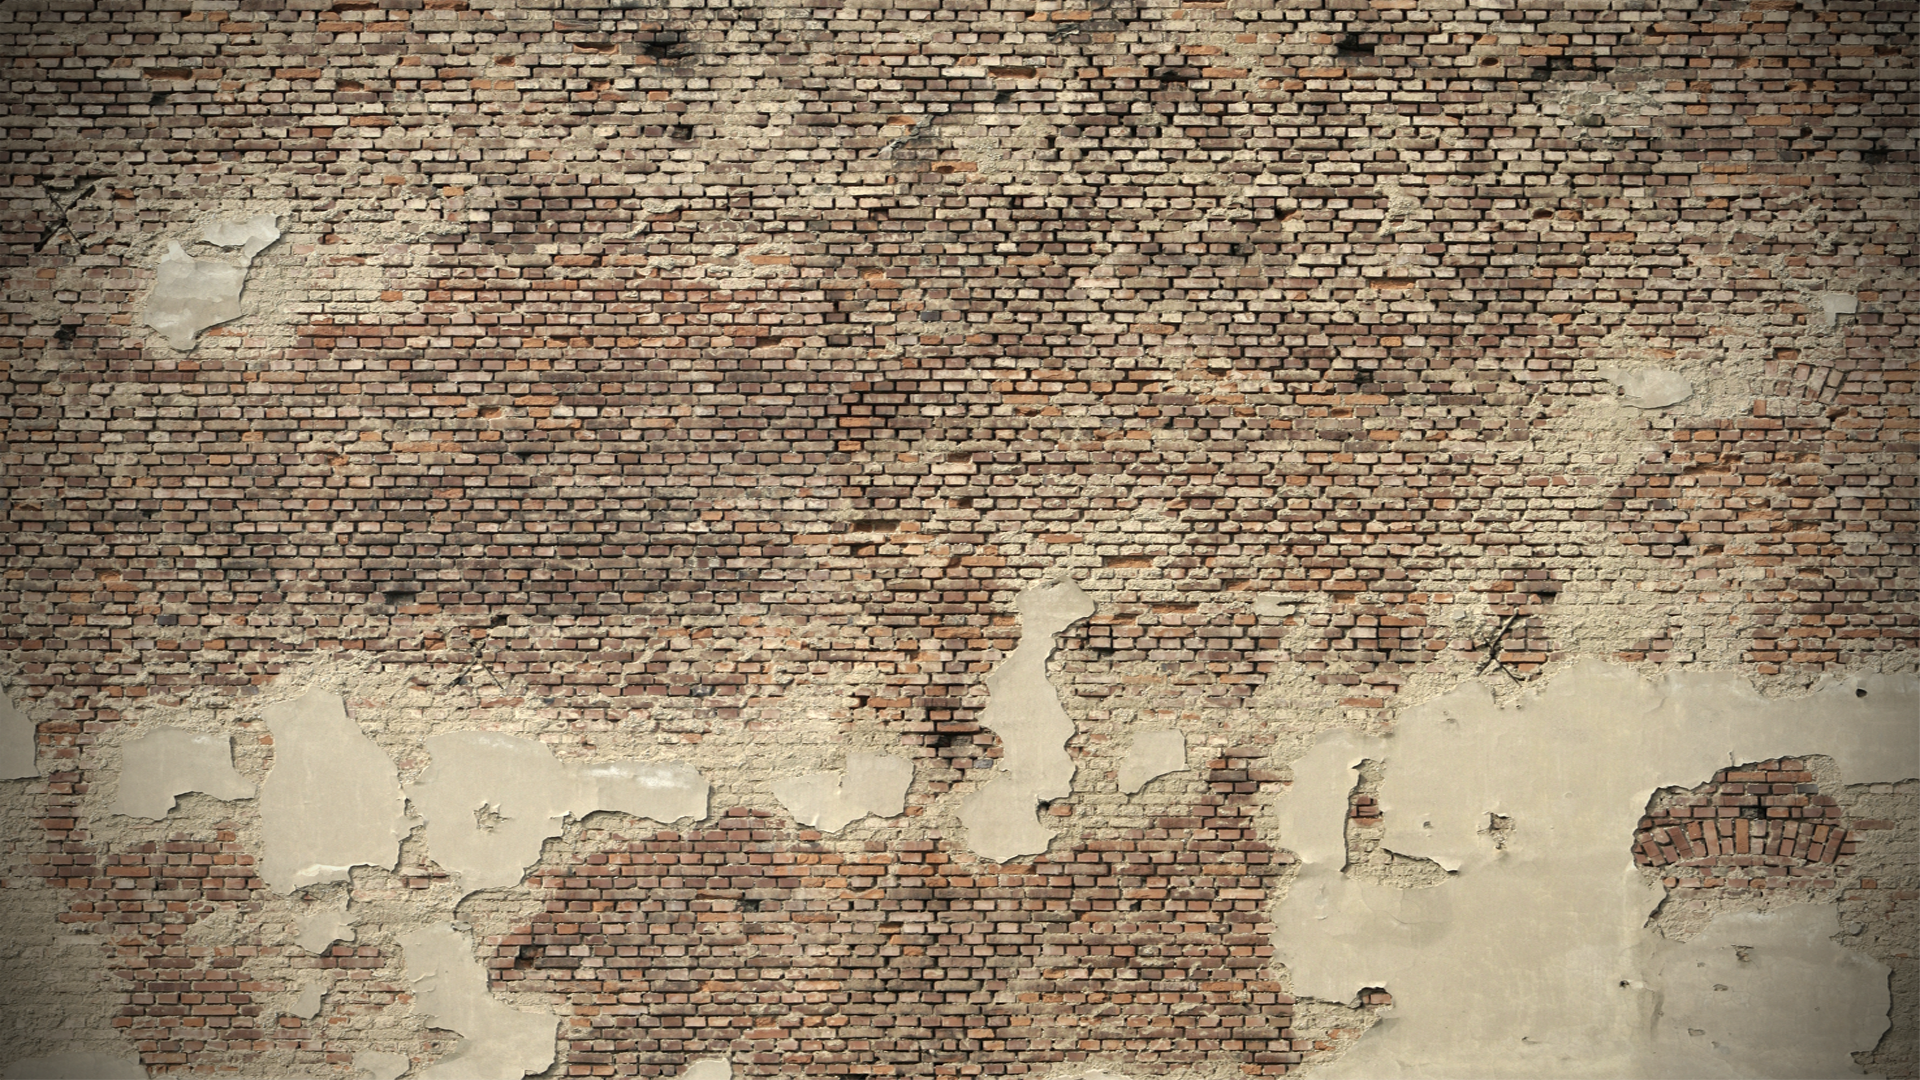 Textured Wallpaper For Walls 2019 Scandinavian Wallpaper Brick Wall Wallpaper Textured Brick Wallpaper